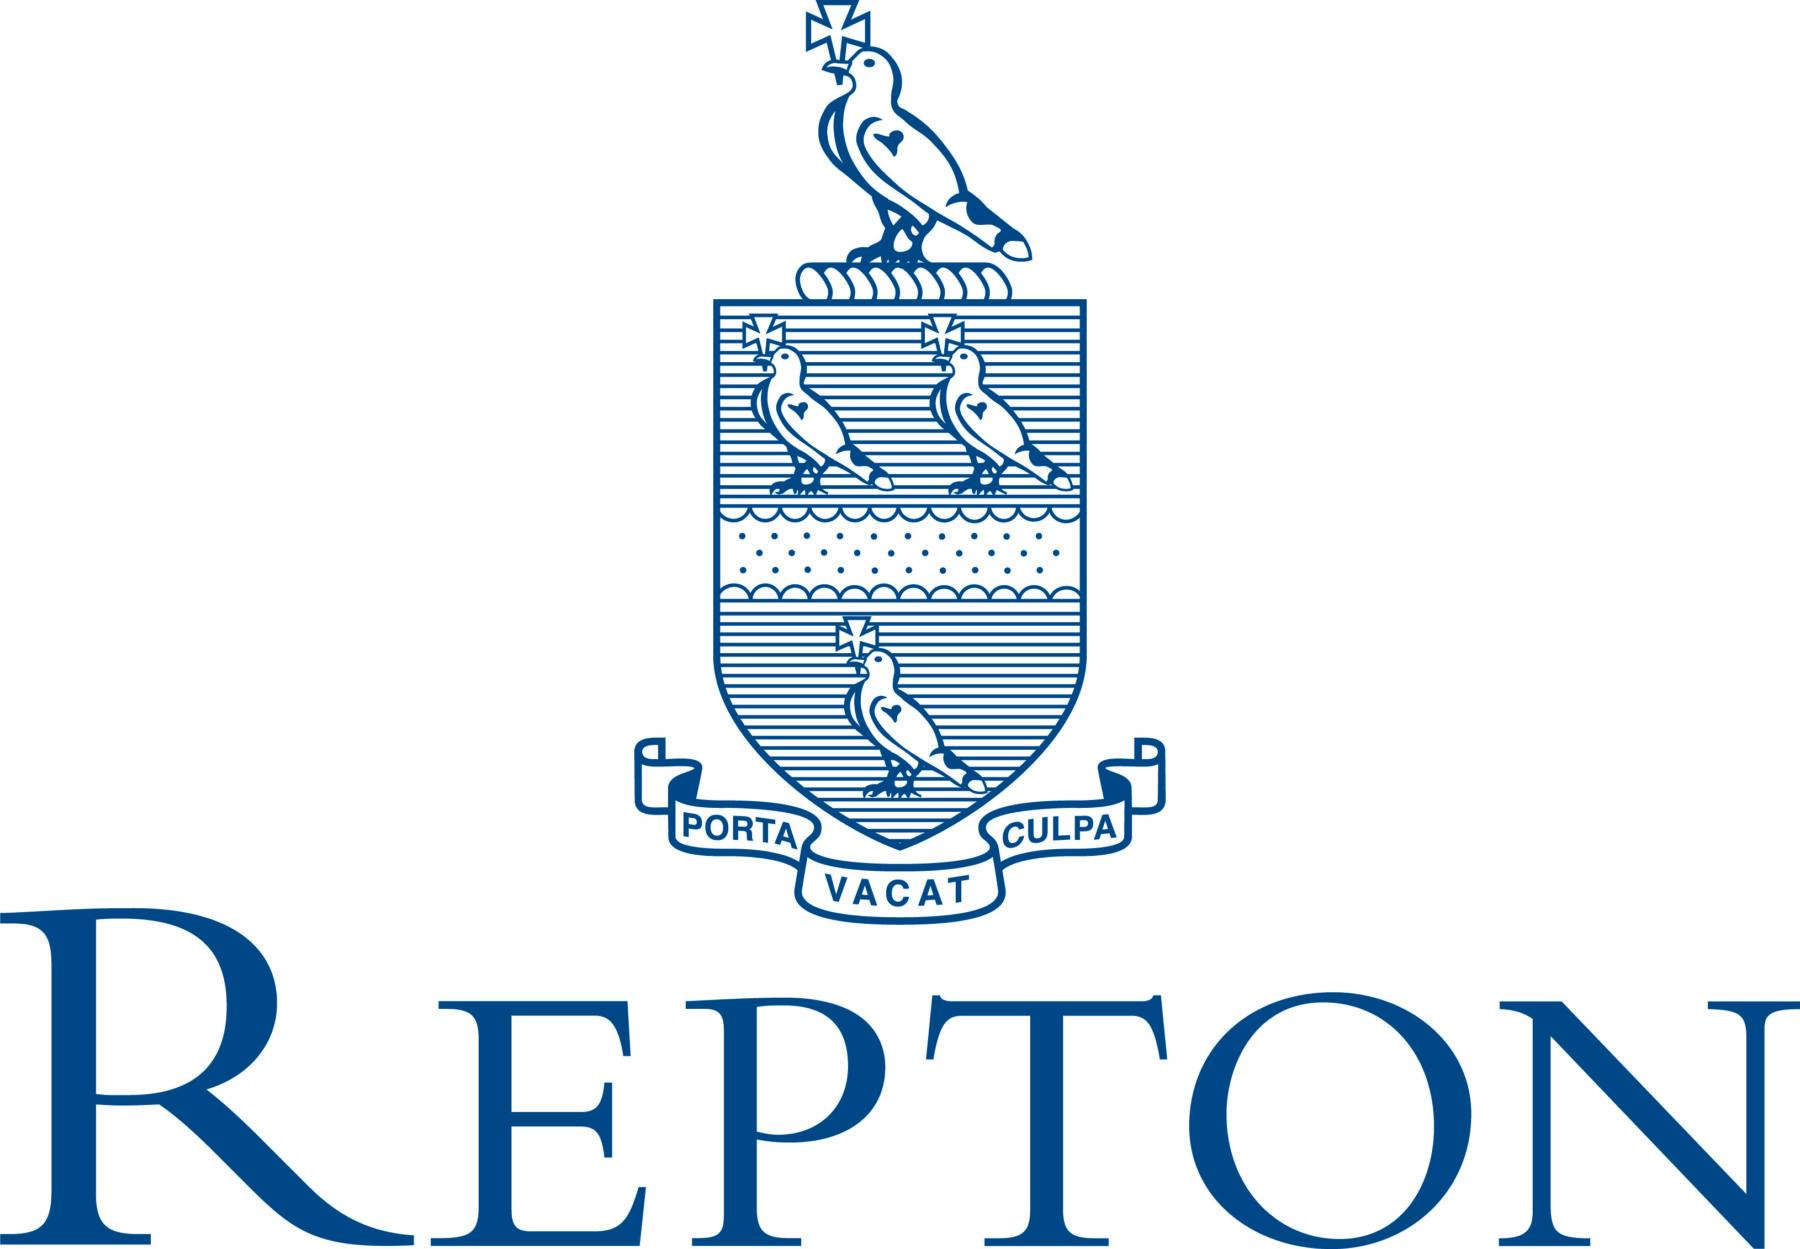 ReptonSchool logo